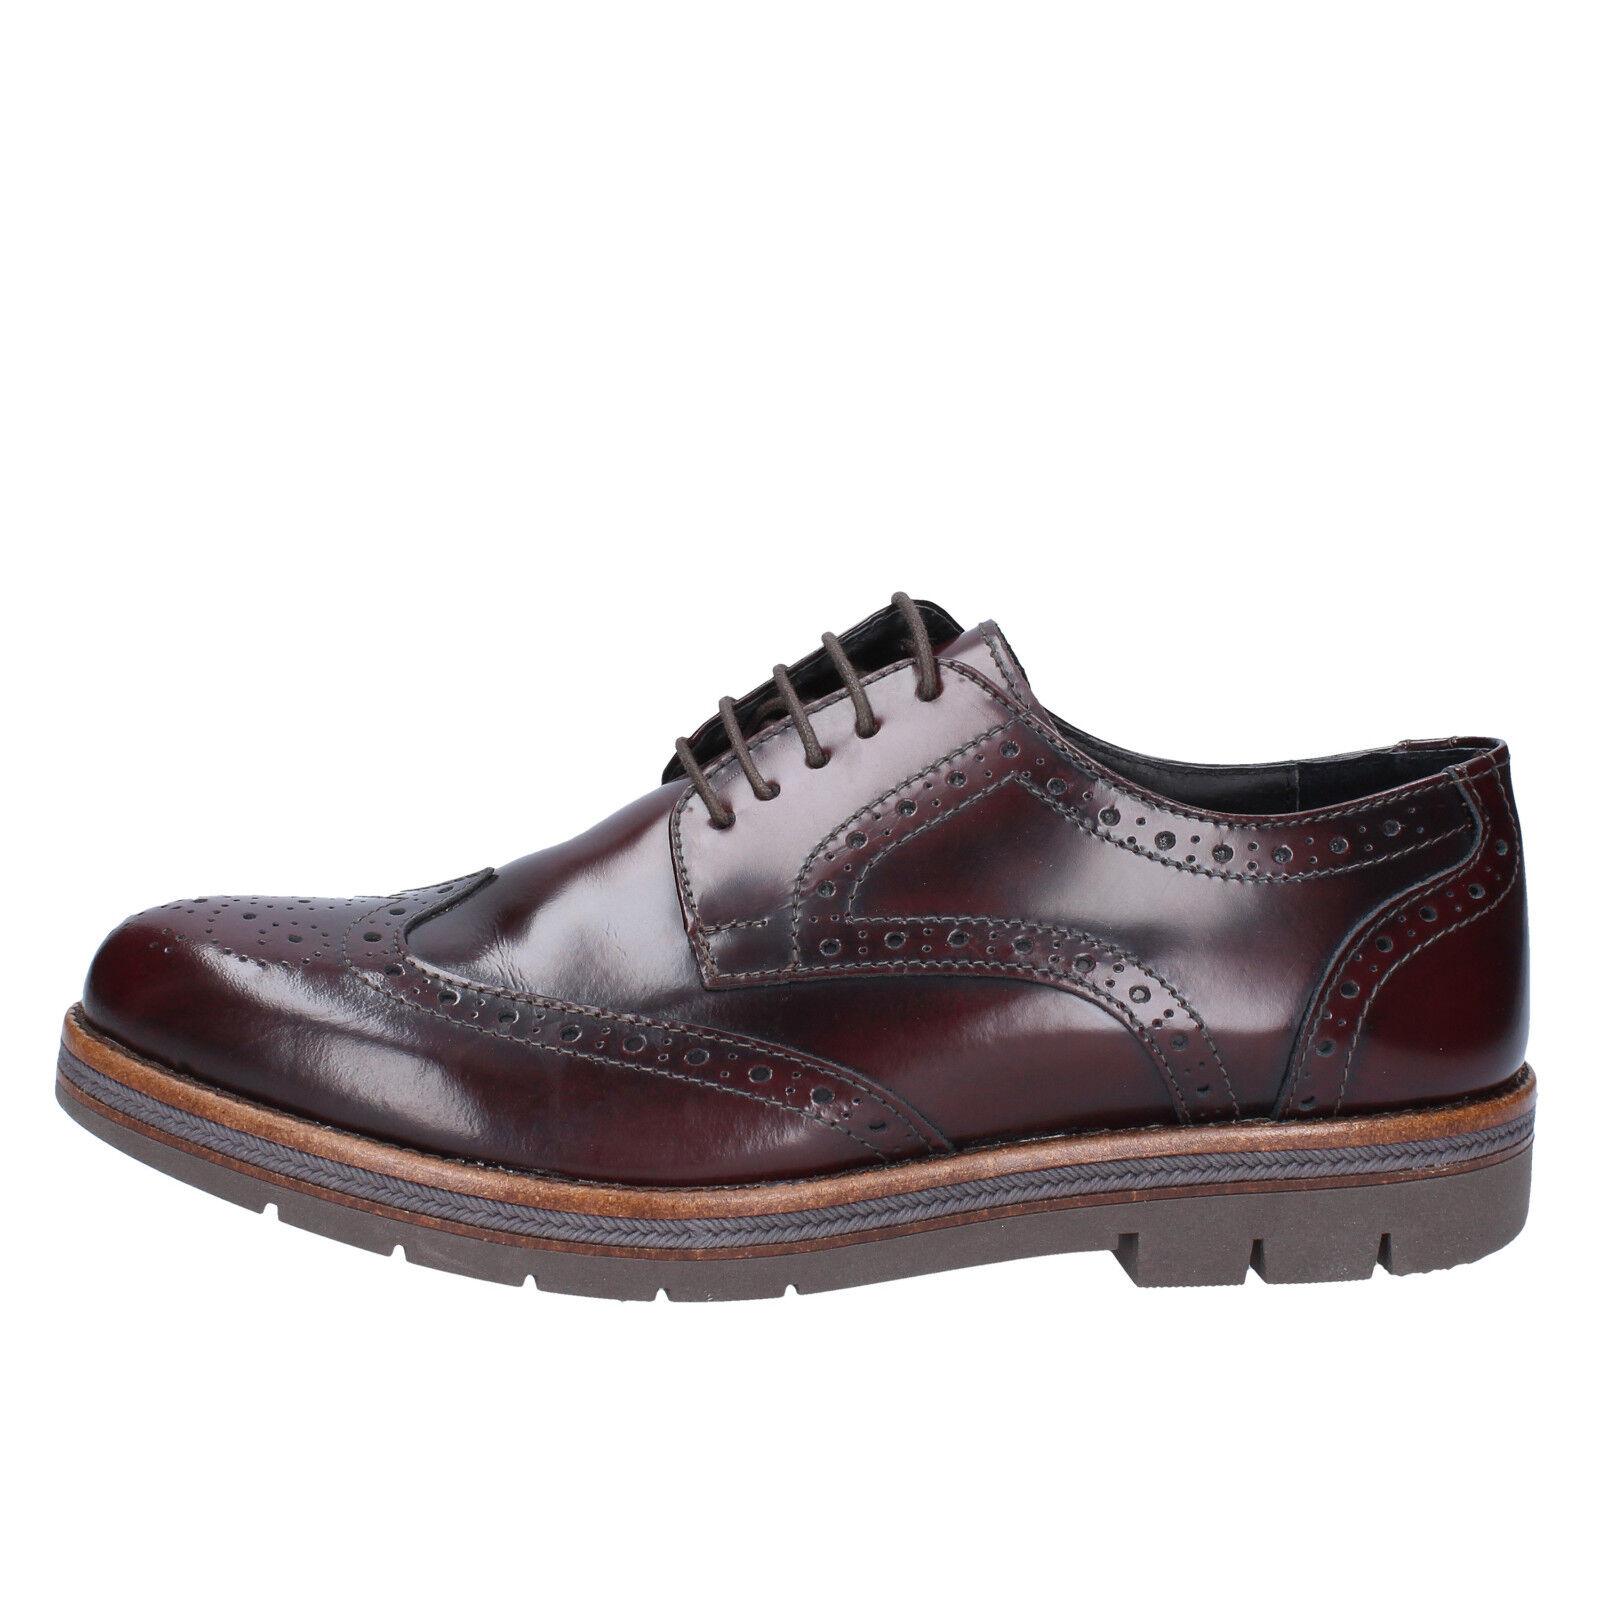 Mens shoes SALVO FERDI 8 (EU 42) elegant burgundy leather BX296-42